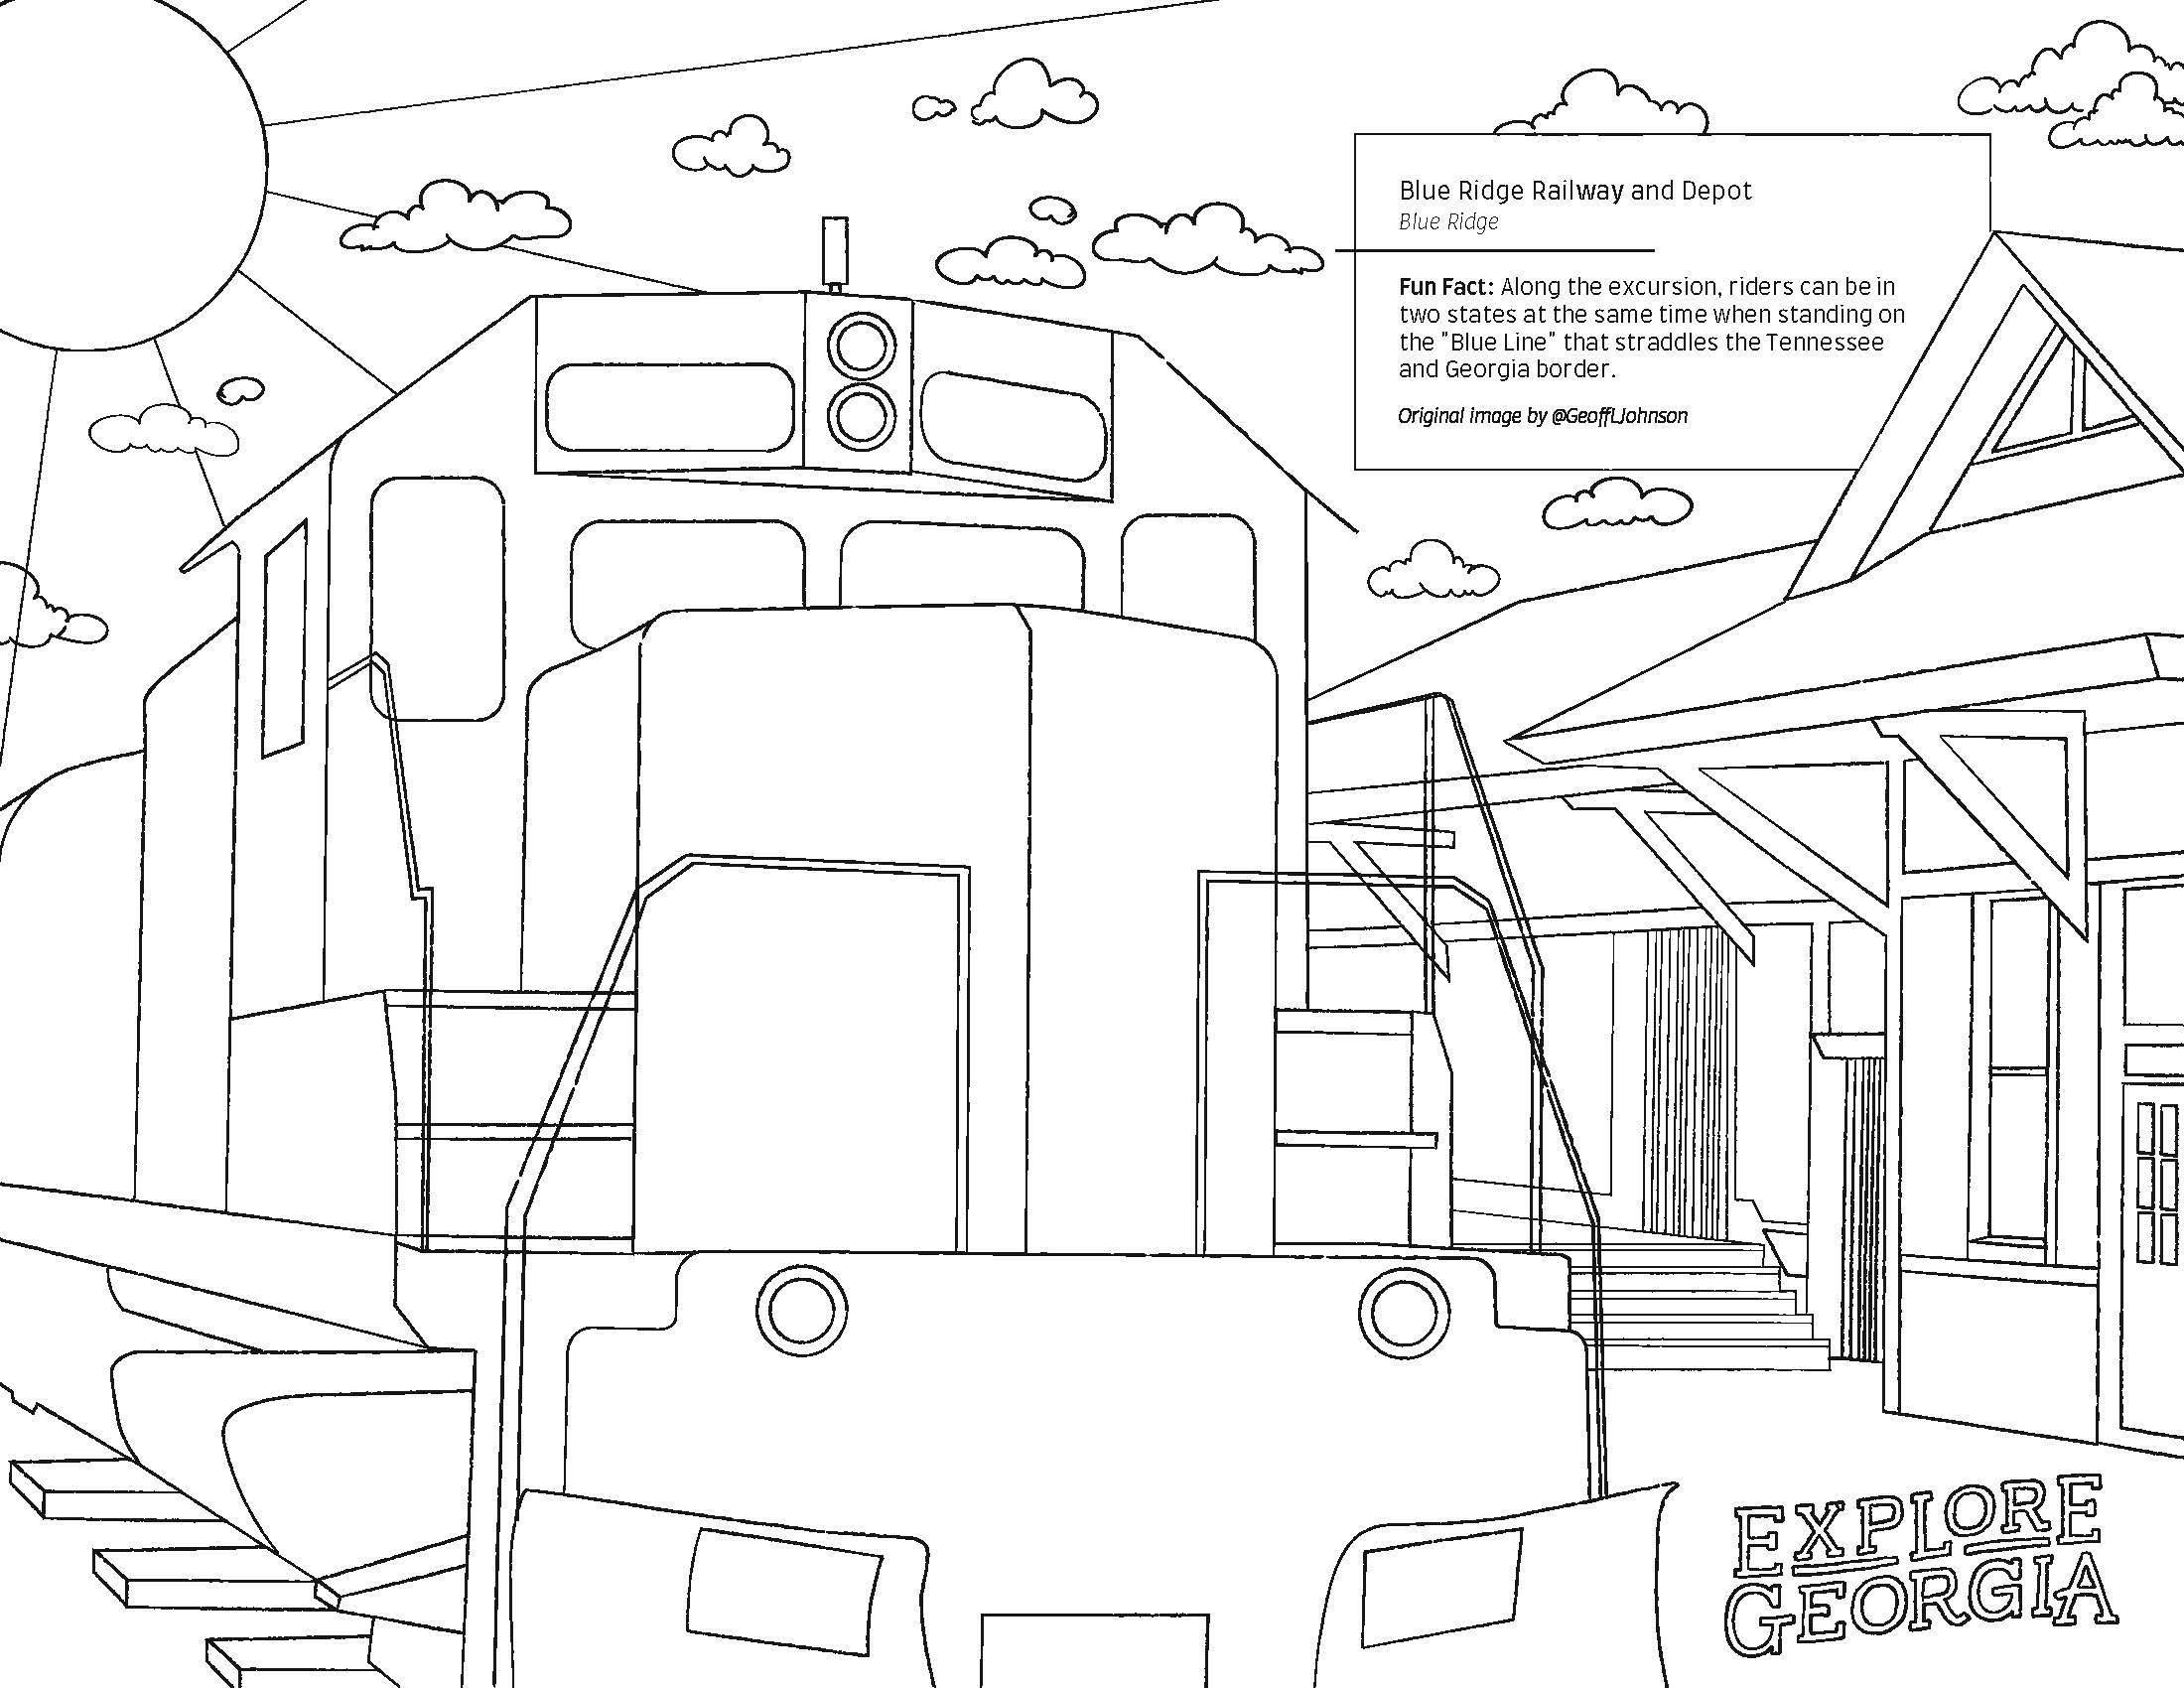 Blue Ridge Railway